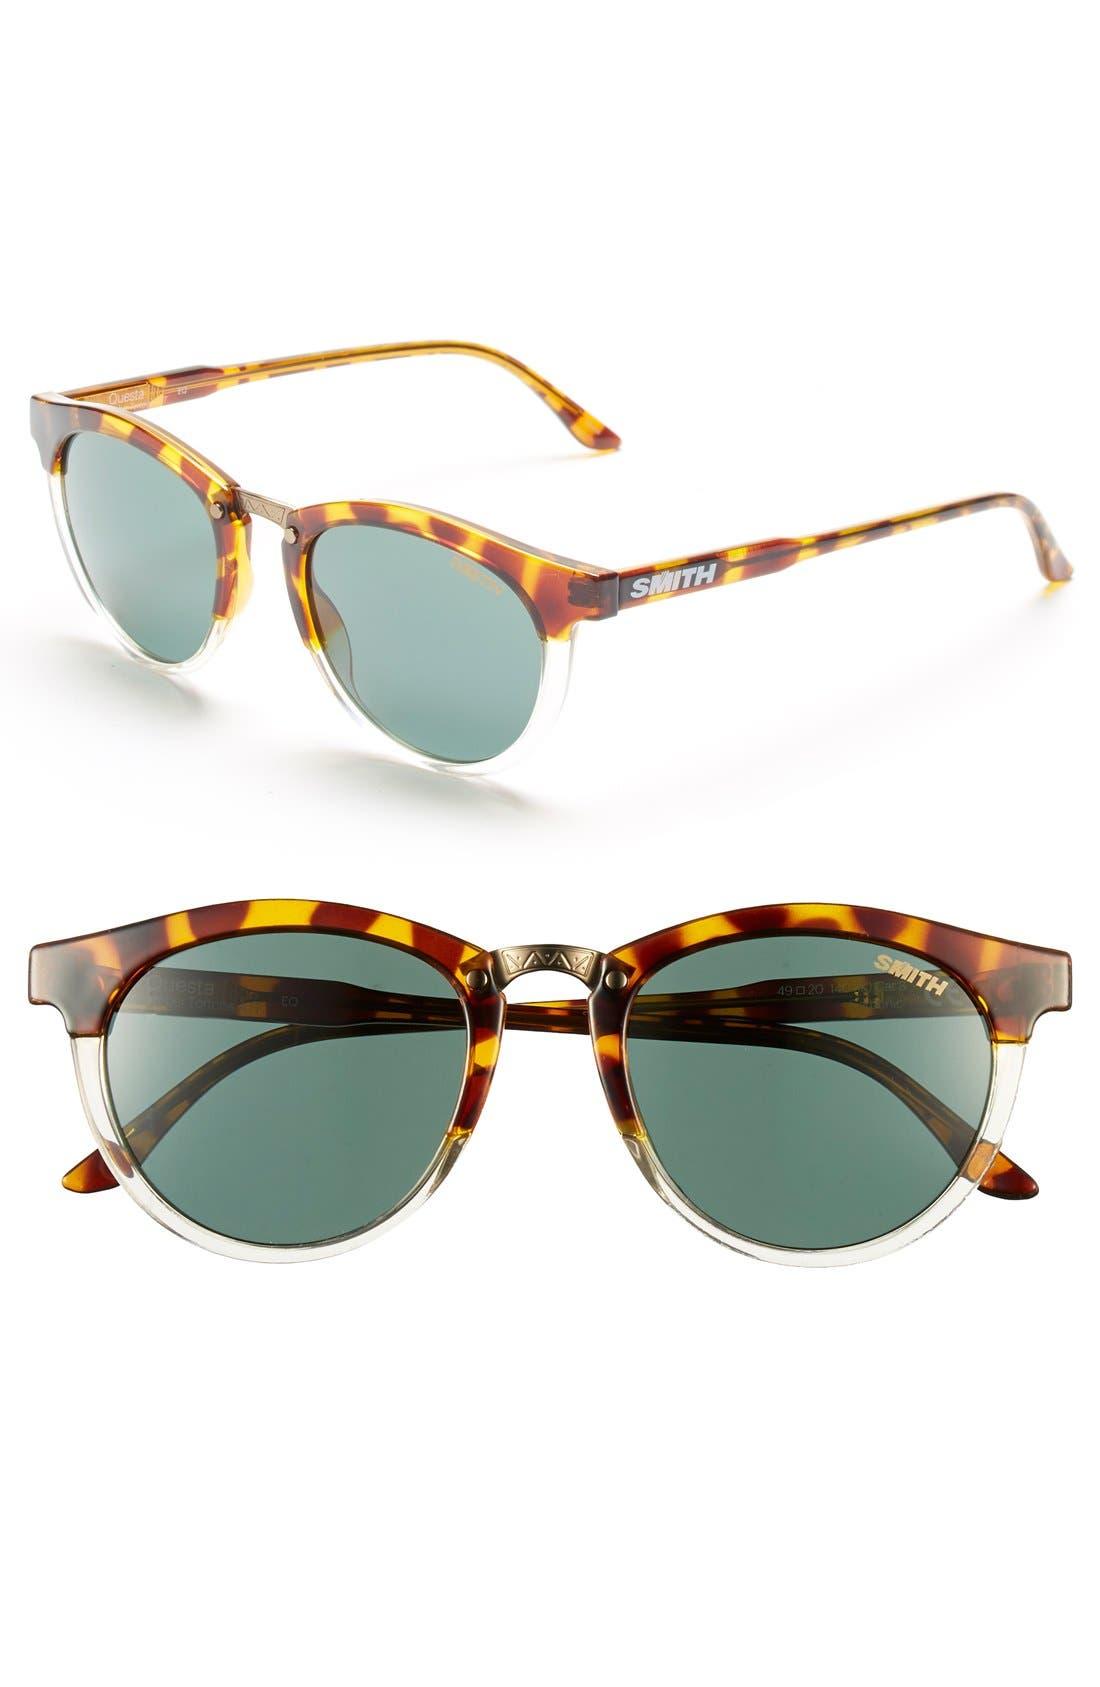 SMITH Questa 49mm Cat Eye Sunglasses